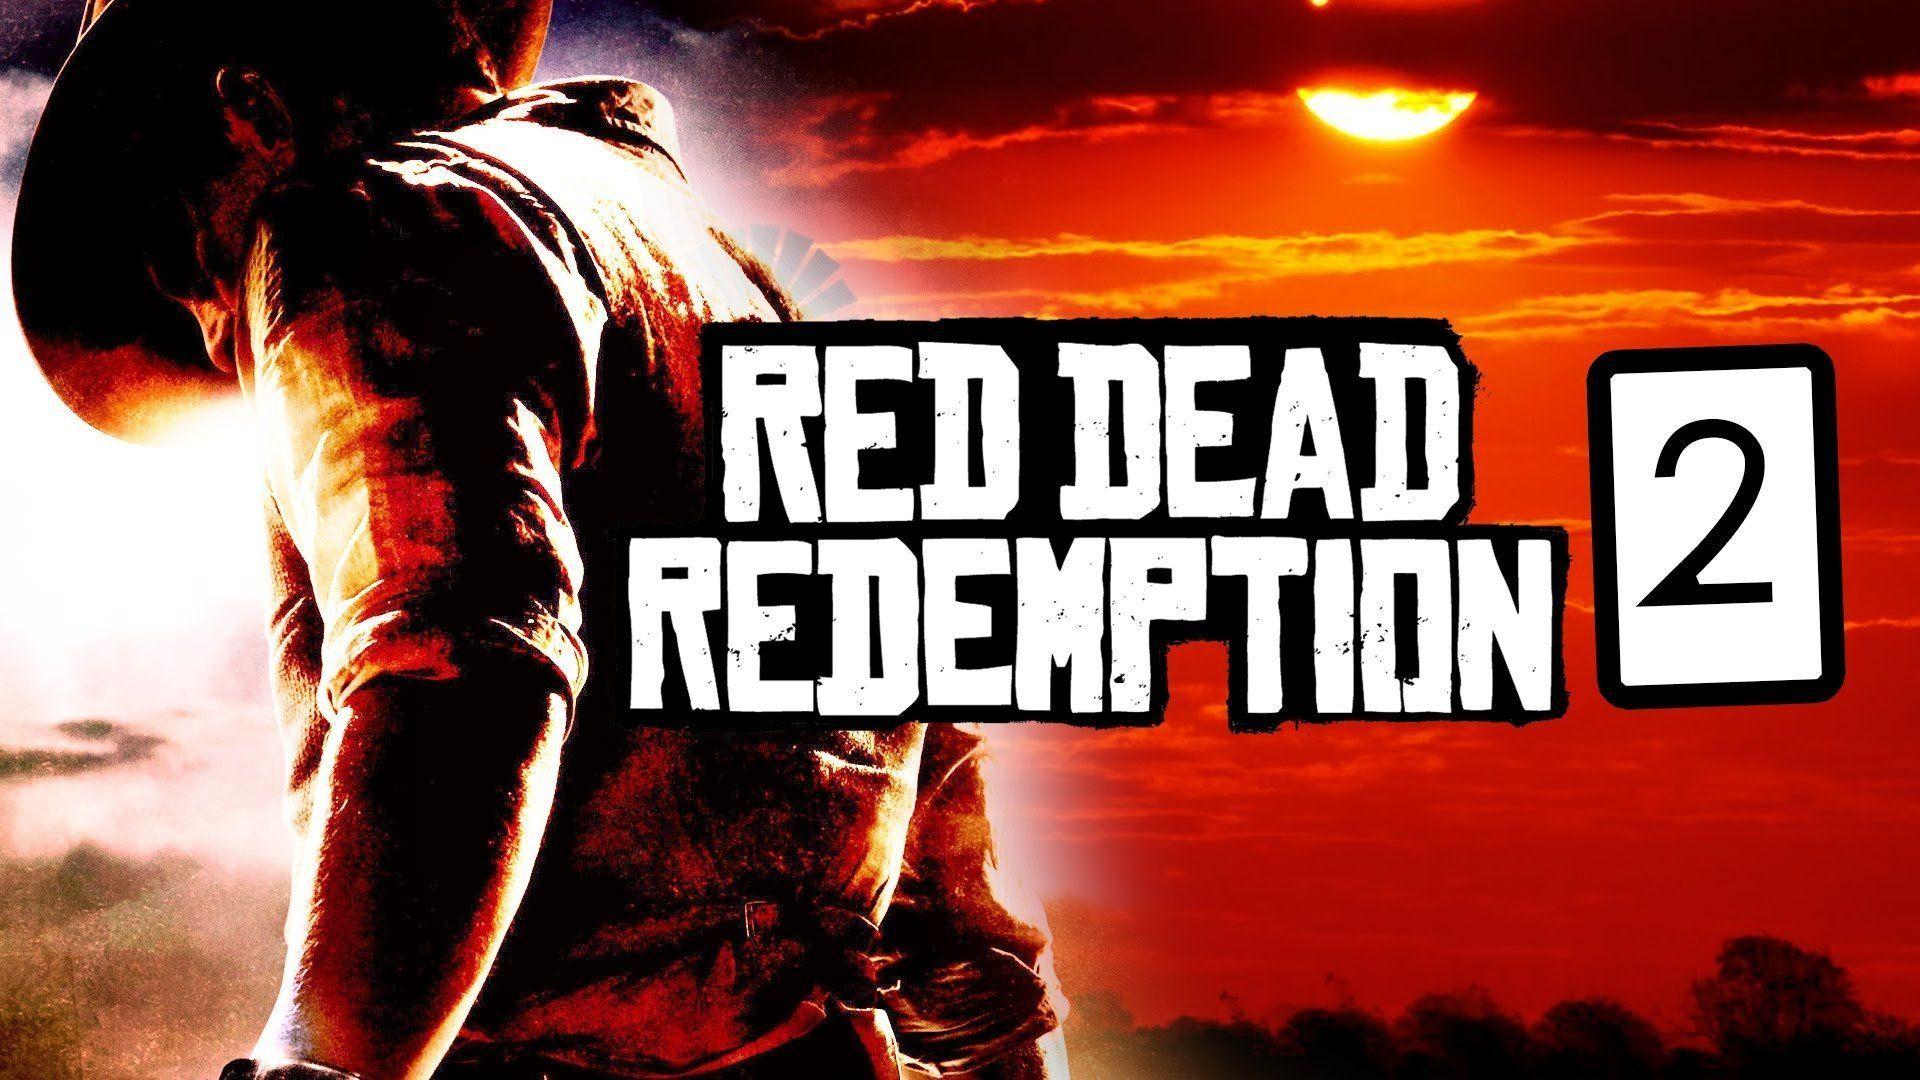 Red Dead Redemption 2 Ps4 Wallpaper Widescreen > Flip